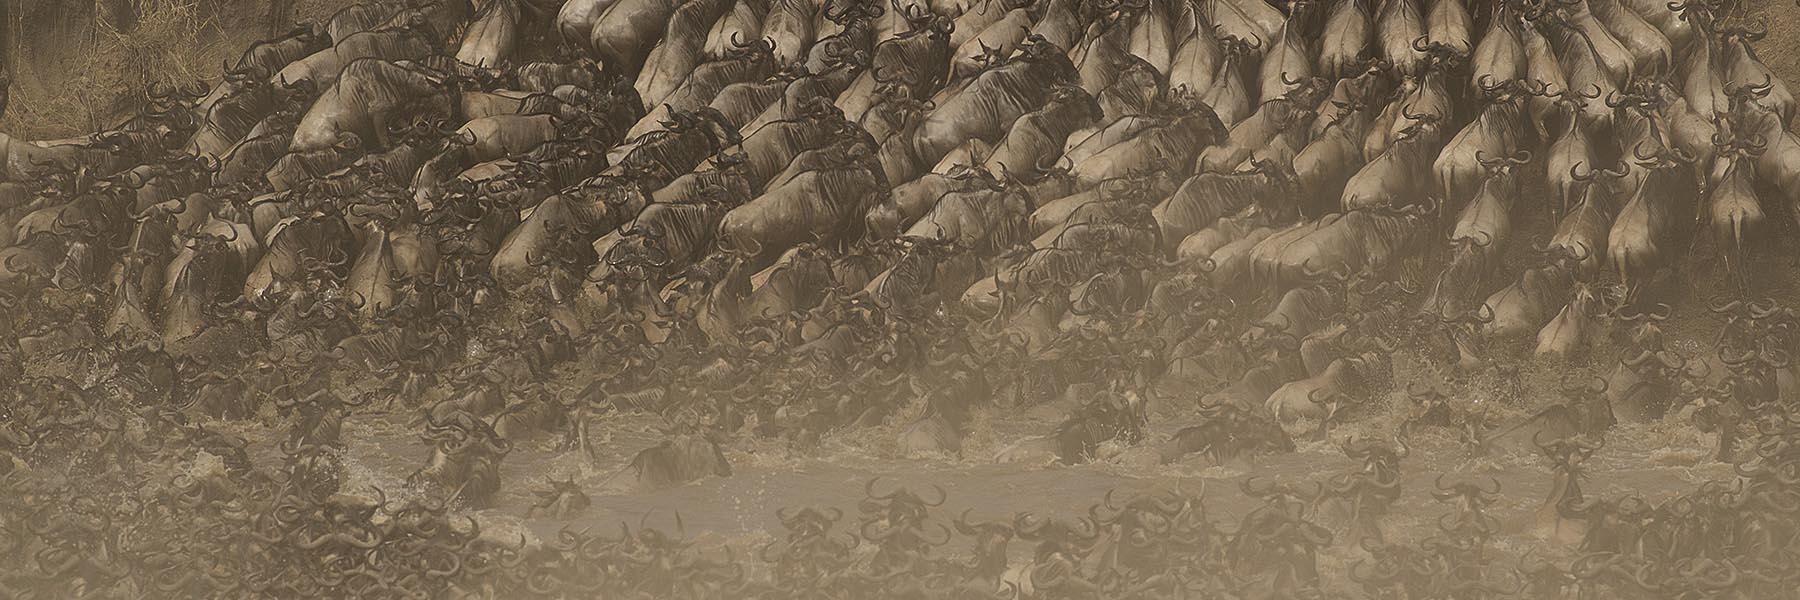 Masai Mara migration experience